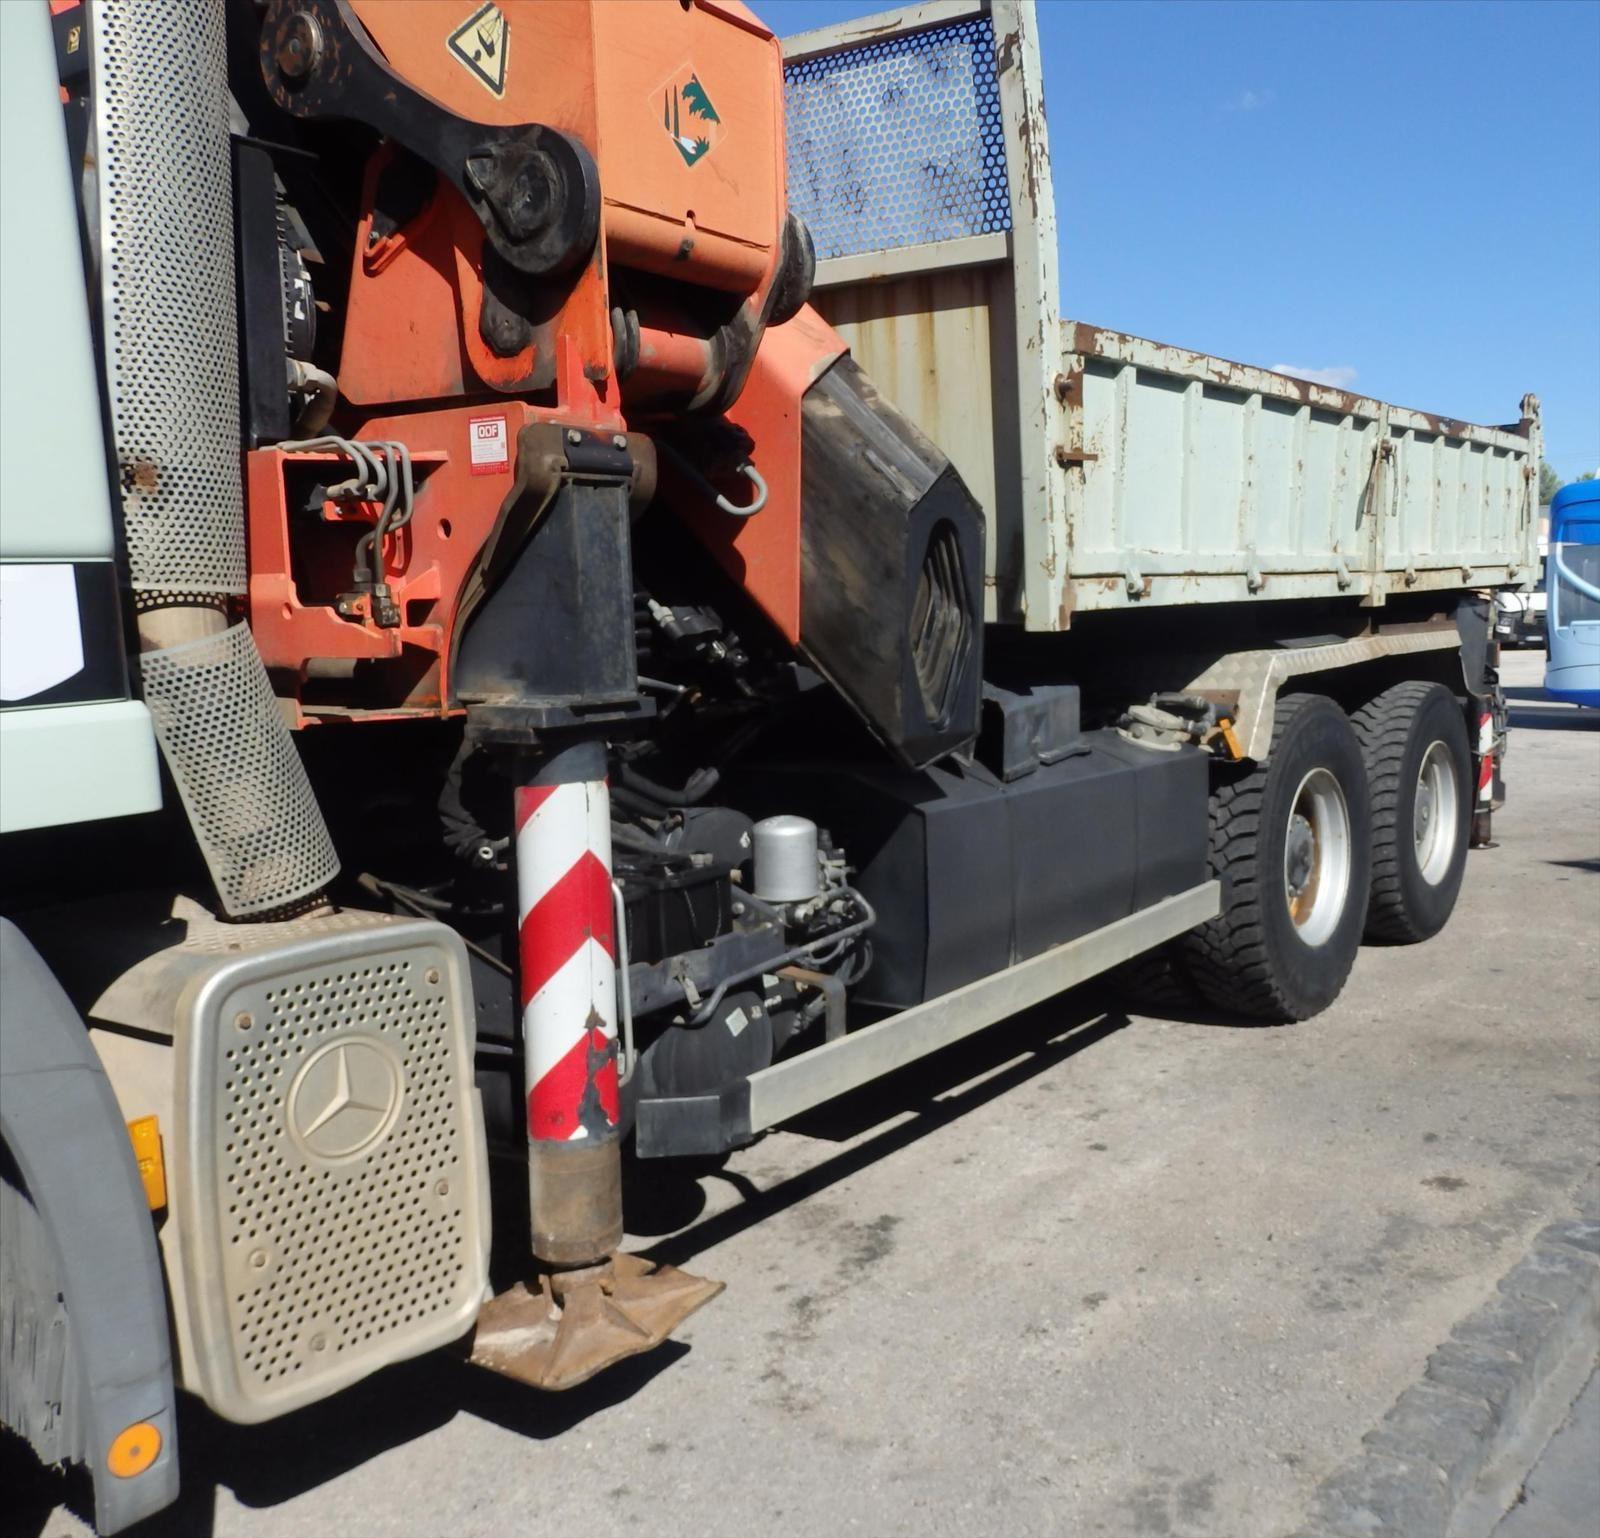 Camion MERCEDES 2640 6x4 Benne Grue Tel: 0608066192 Pierre BASSAT TRANSCOMM13